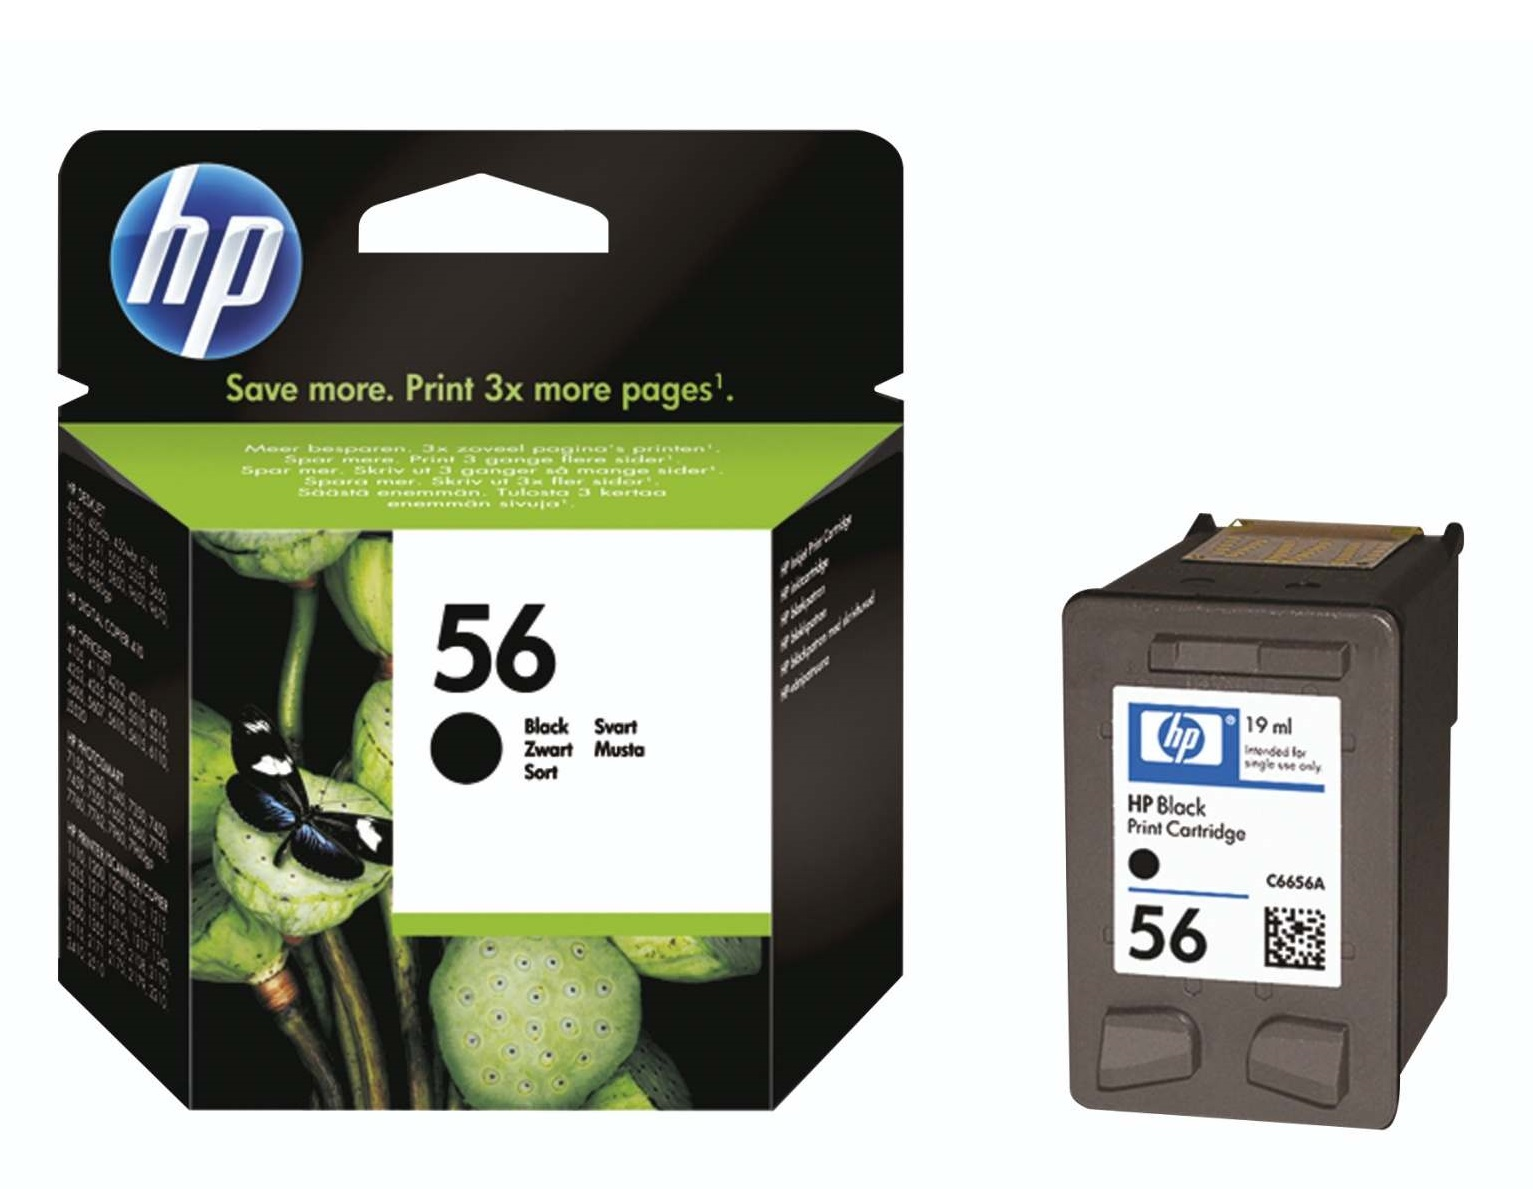 HP 56 Black Inkjet Cartridge